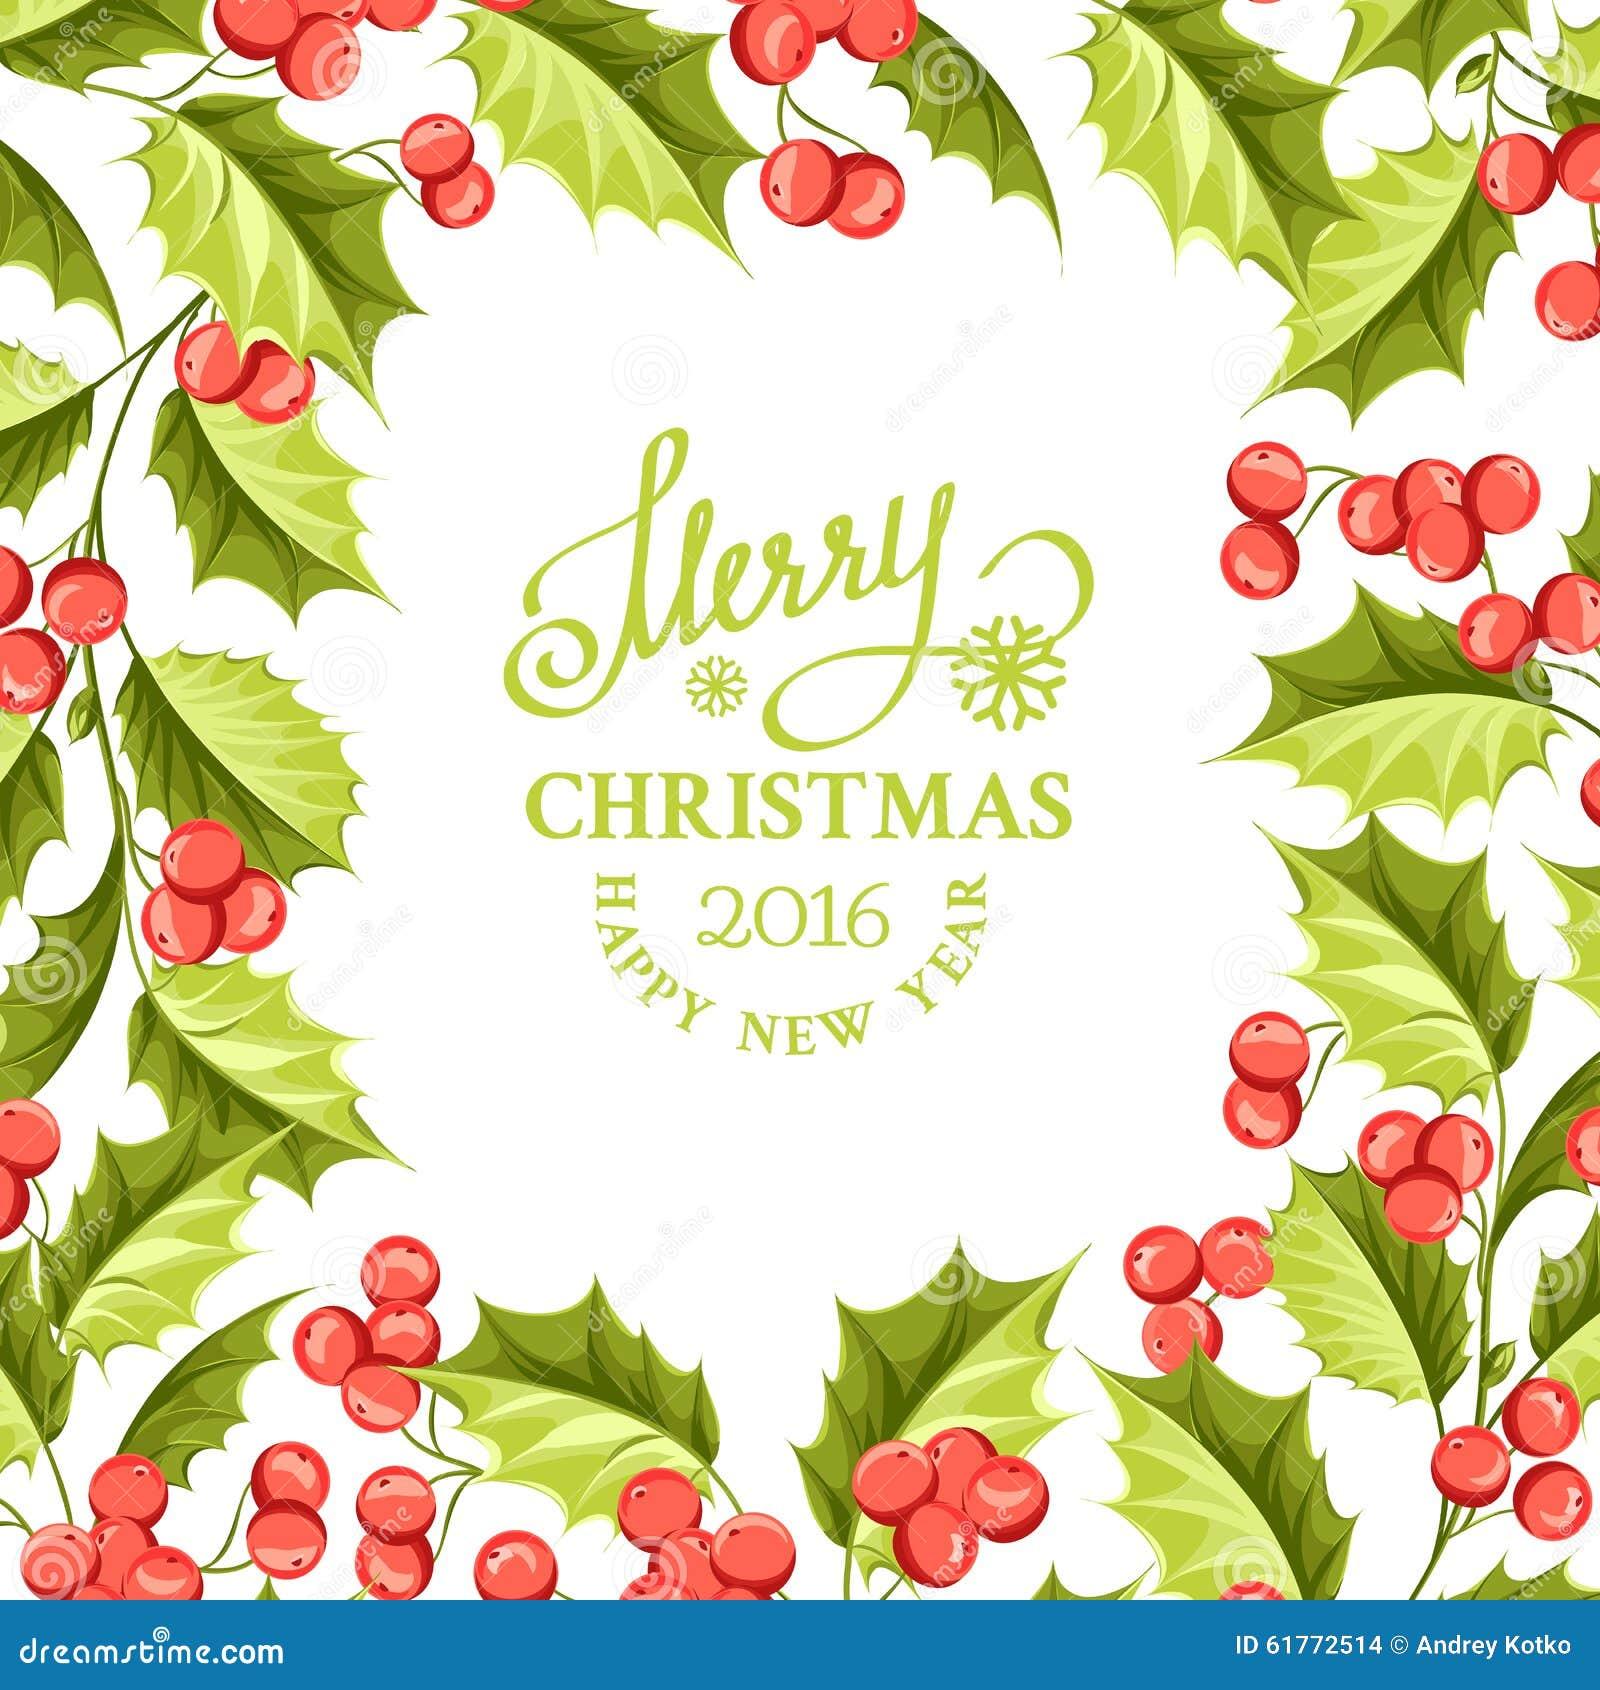 Christmas mistletoe holiday card with text stock vector christmas mistletoe holiday card with text buycottarizona Image collections